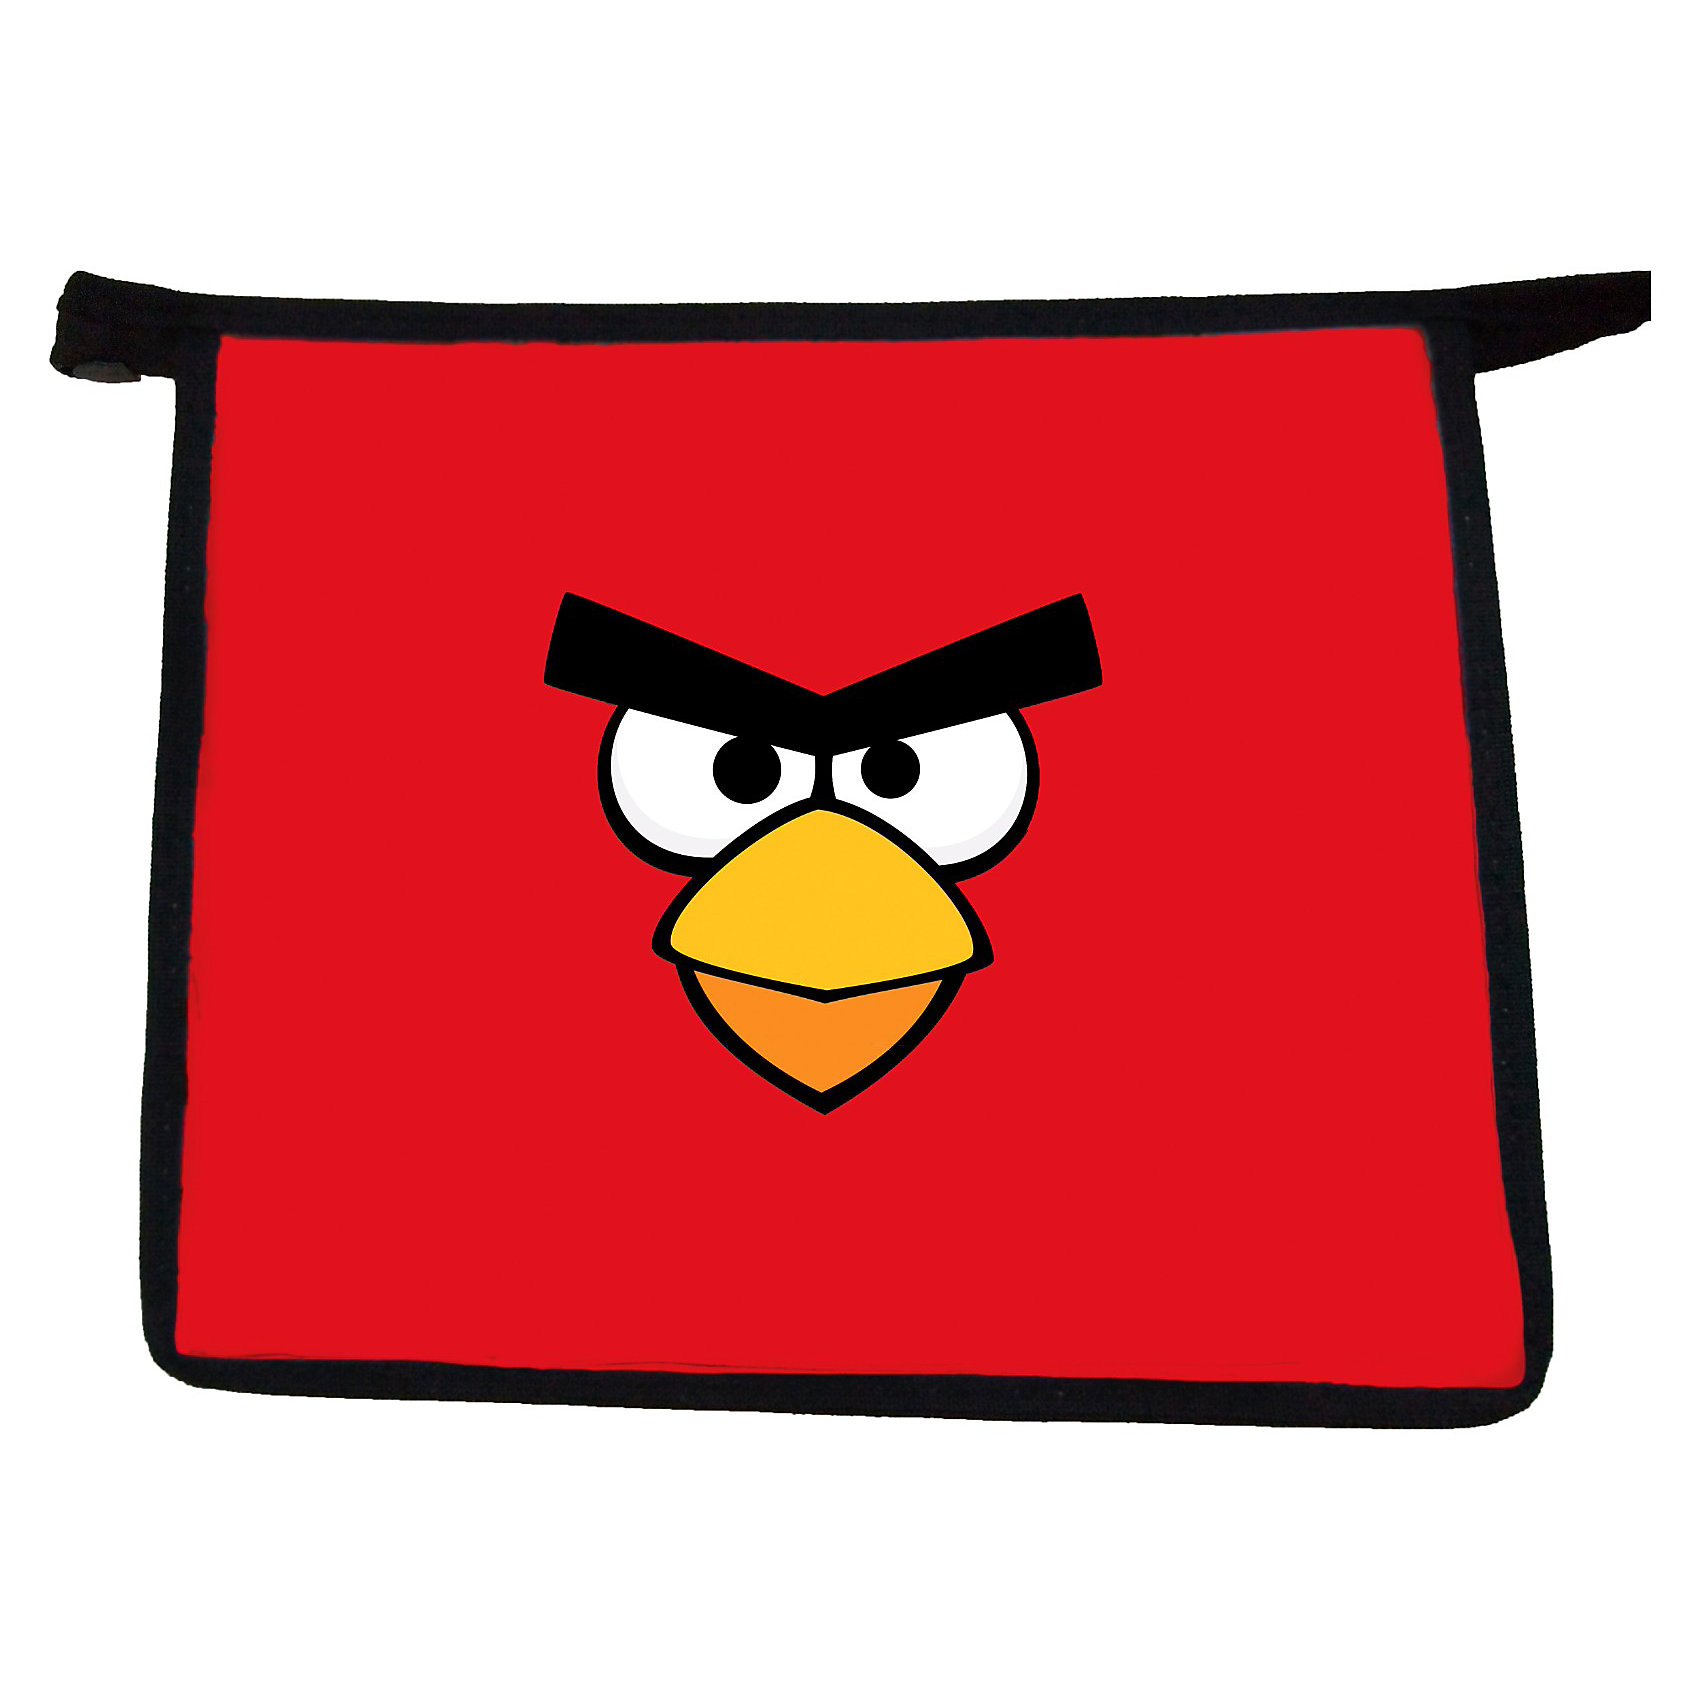 Папка для тетрадей А5, Angry birds, CENTRUM